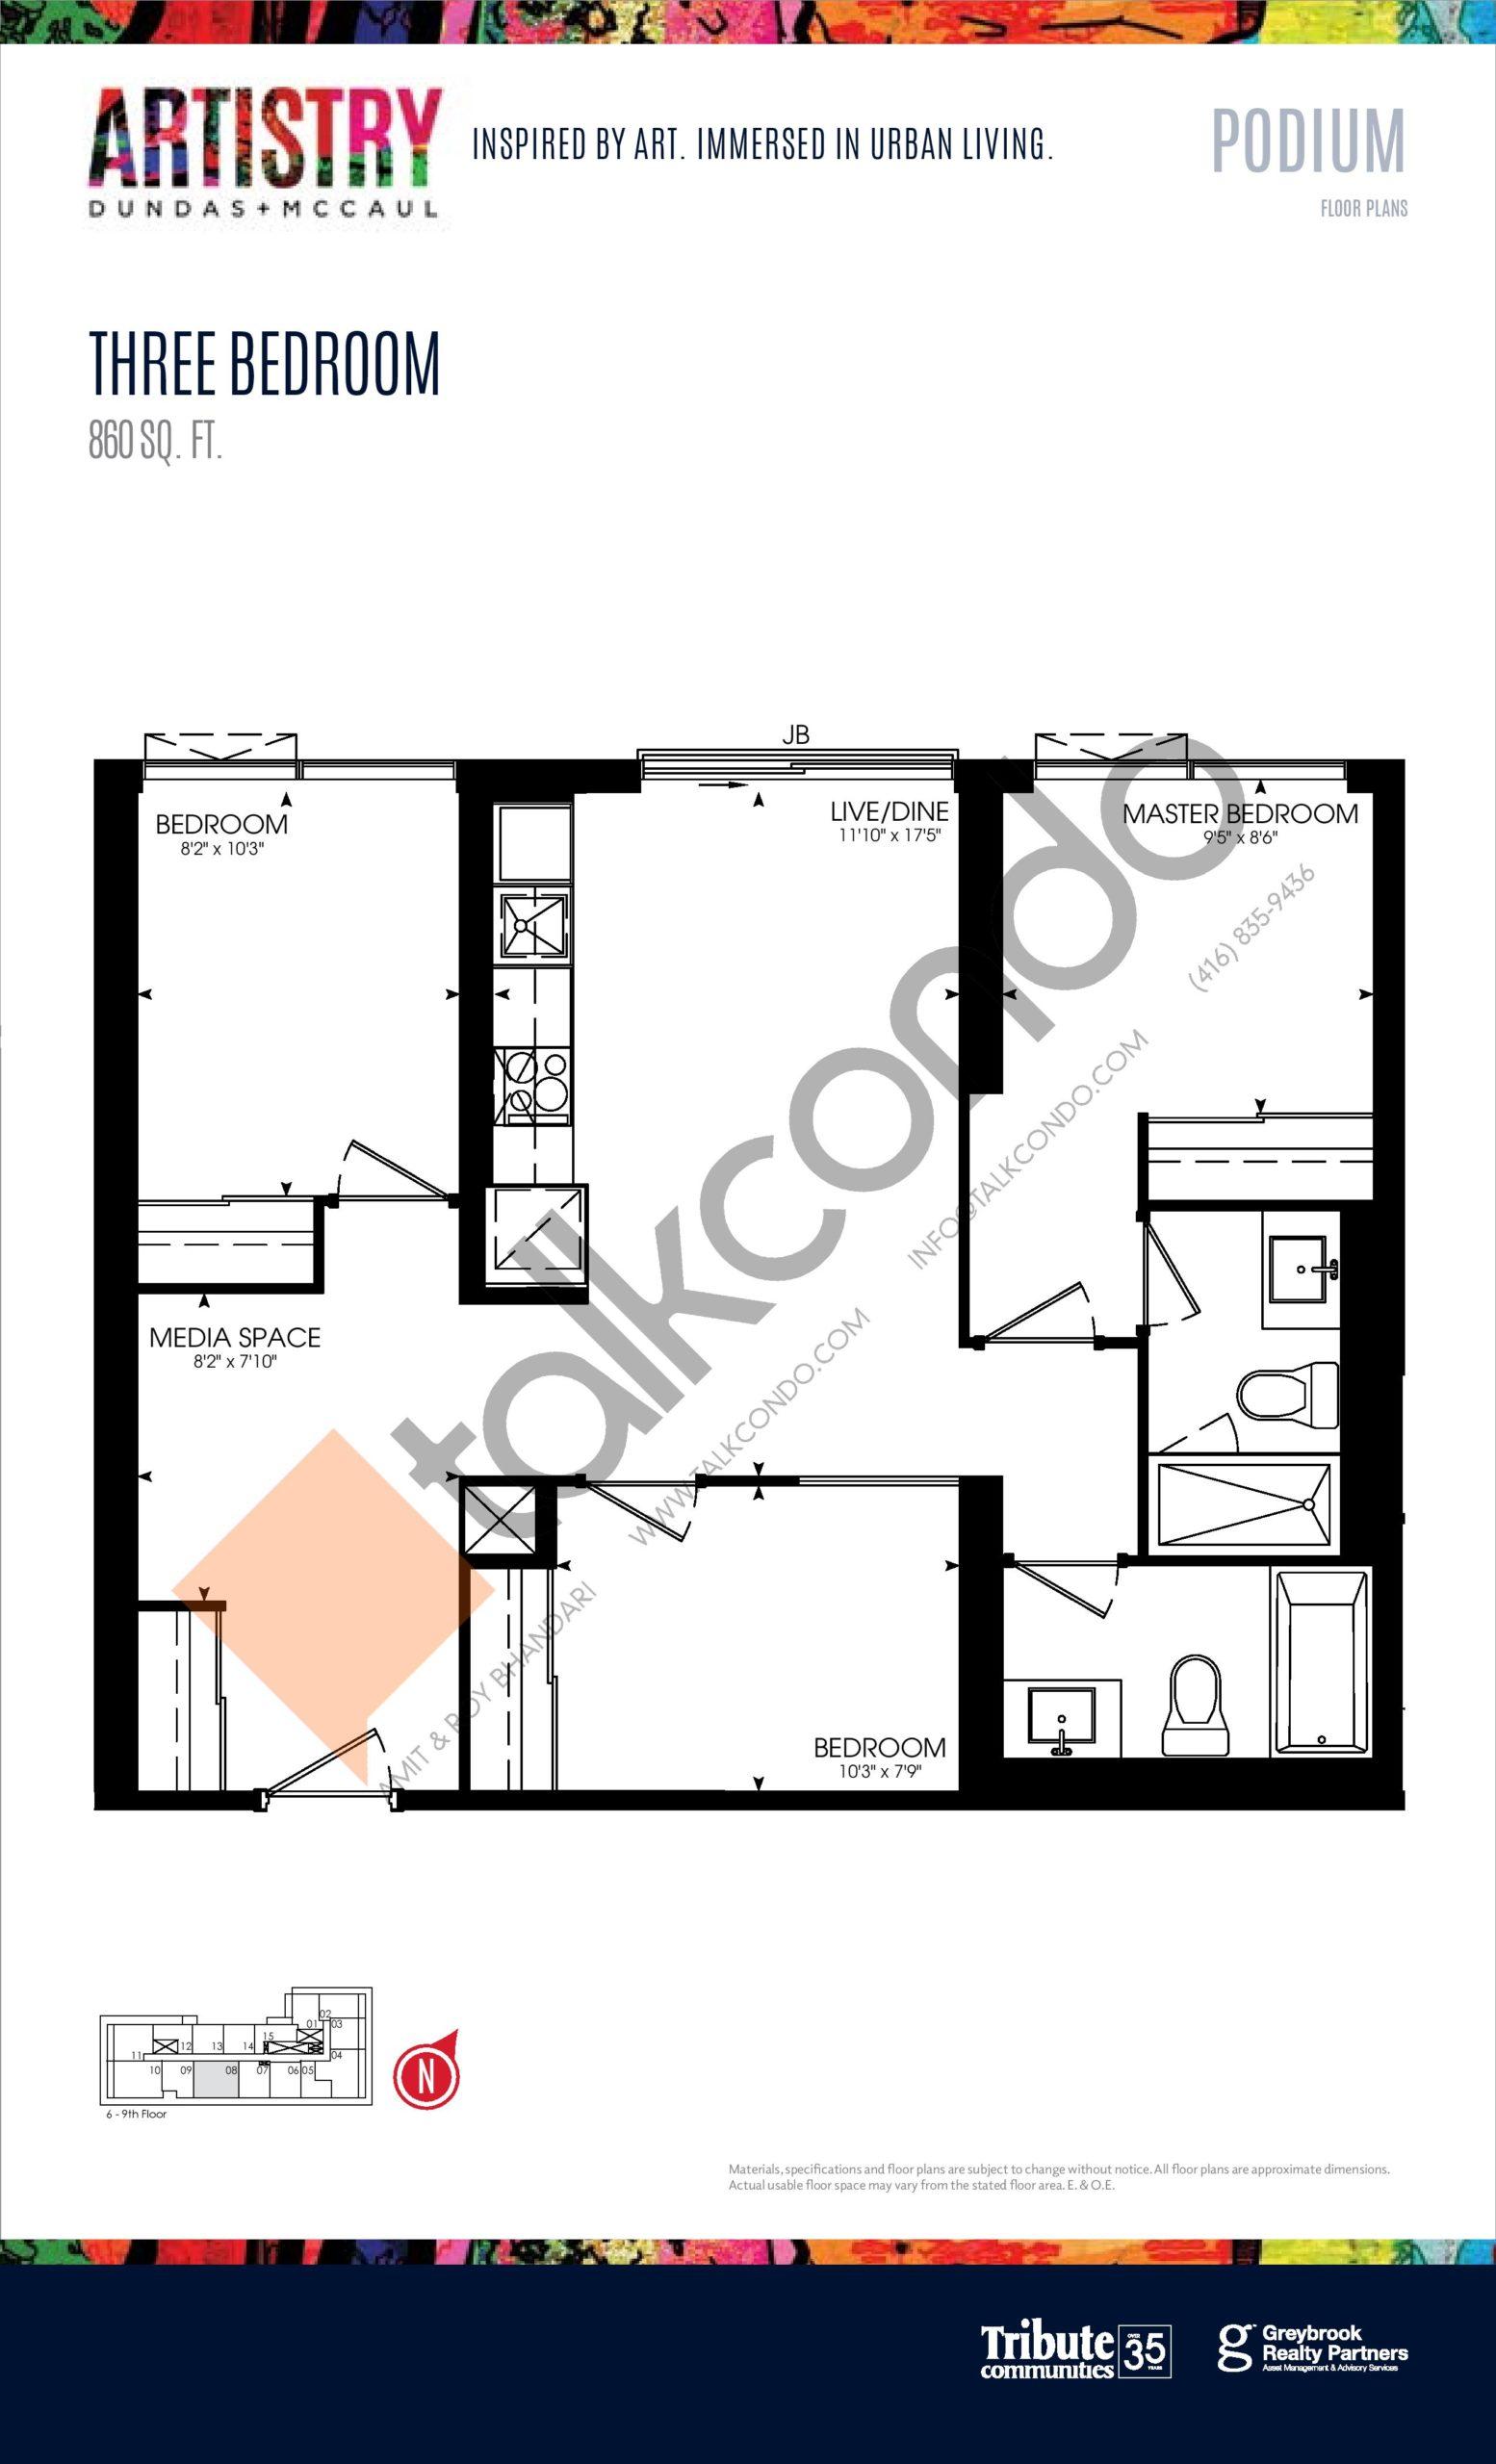 860 sq. ft. - Podium Floor Plan at Artistry Condos - 860 sq.ft